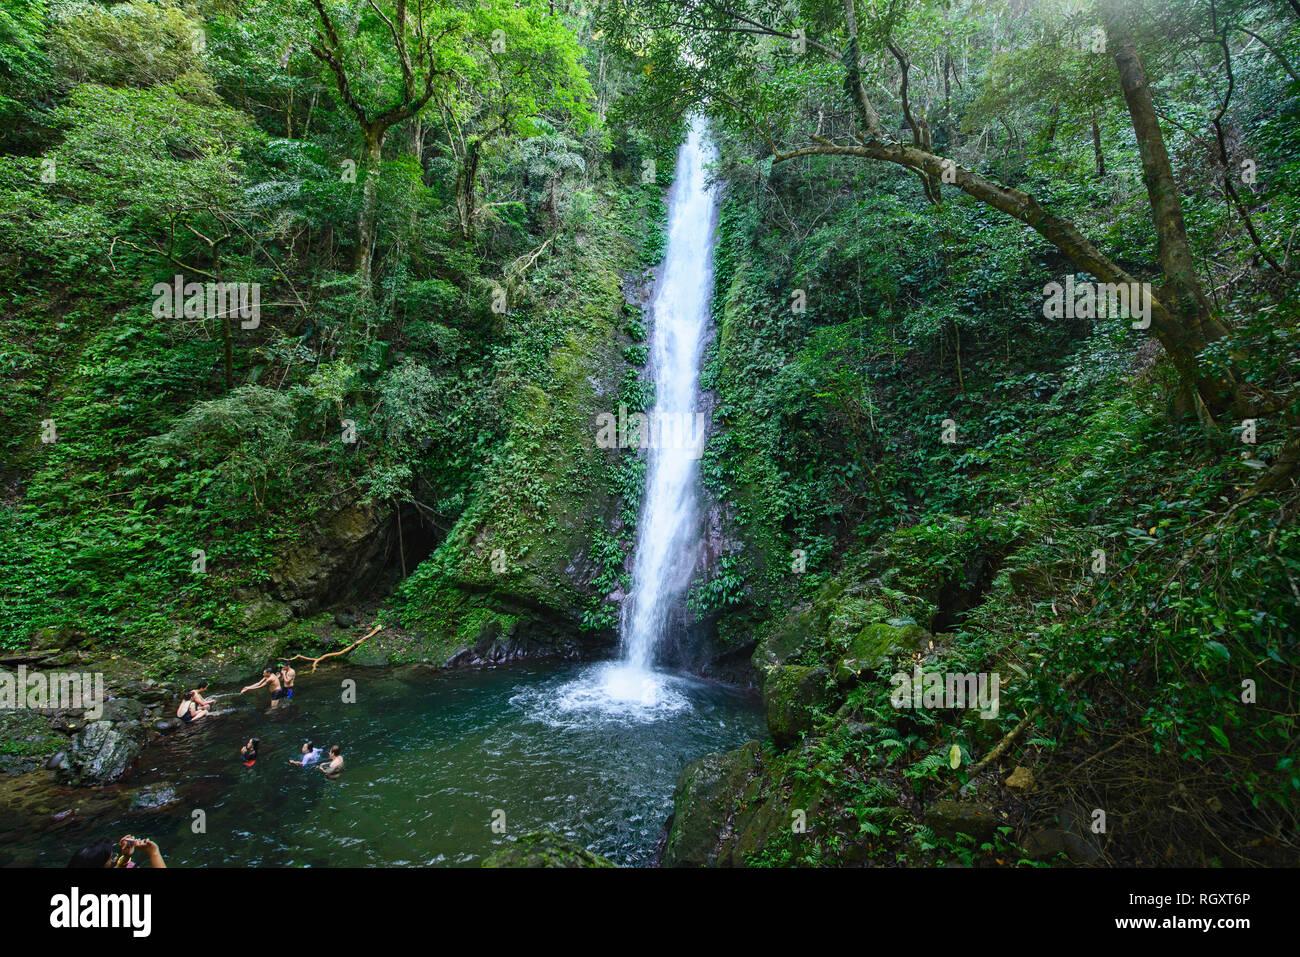 Beautiful Kabigan Falls, Pagudpud, Ilocos Norte, Philippines Stock Photo